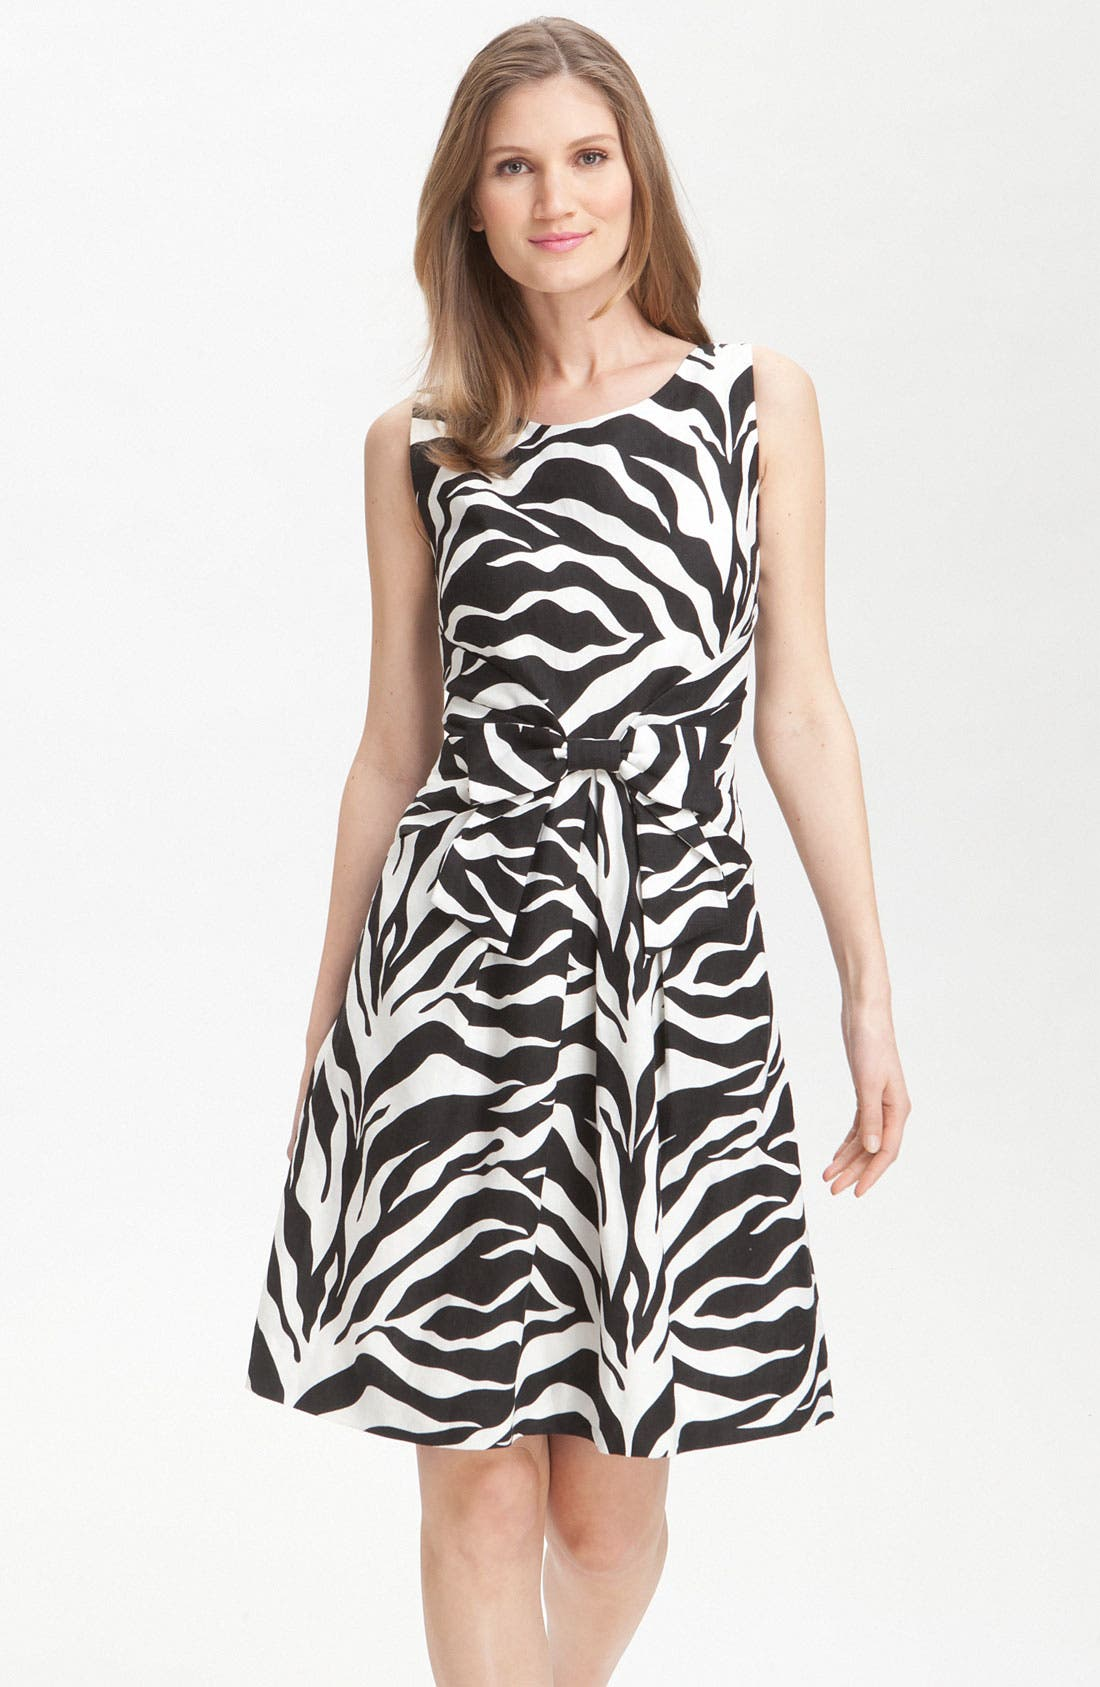 Main Image - kate spade new york 'jillian' animal print dress